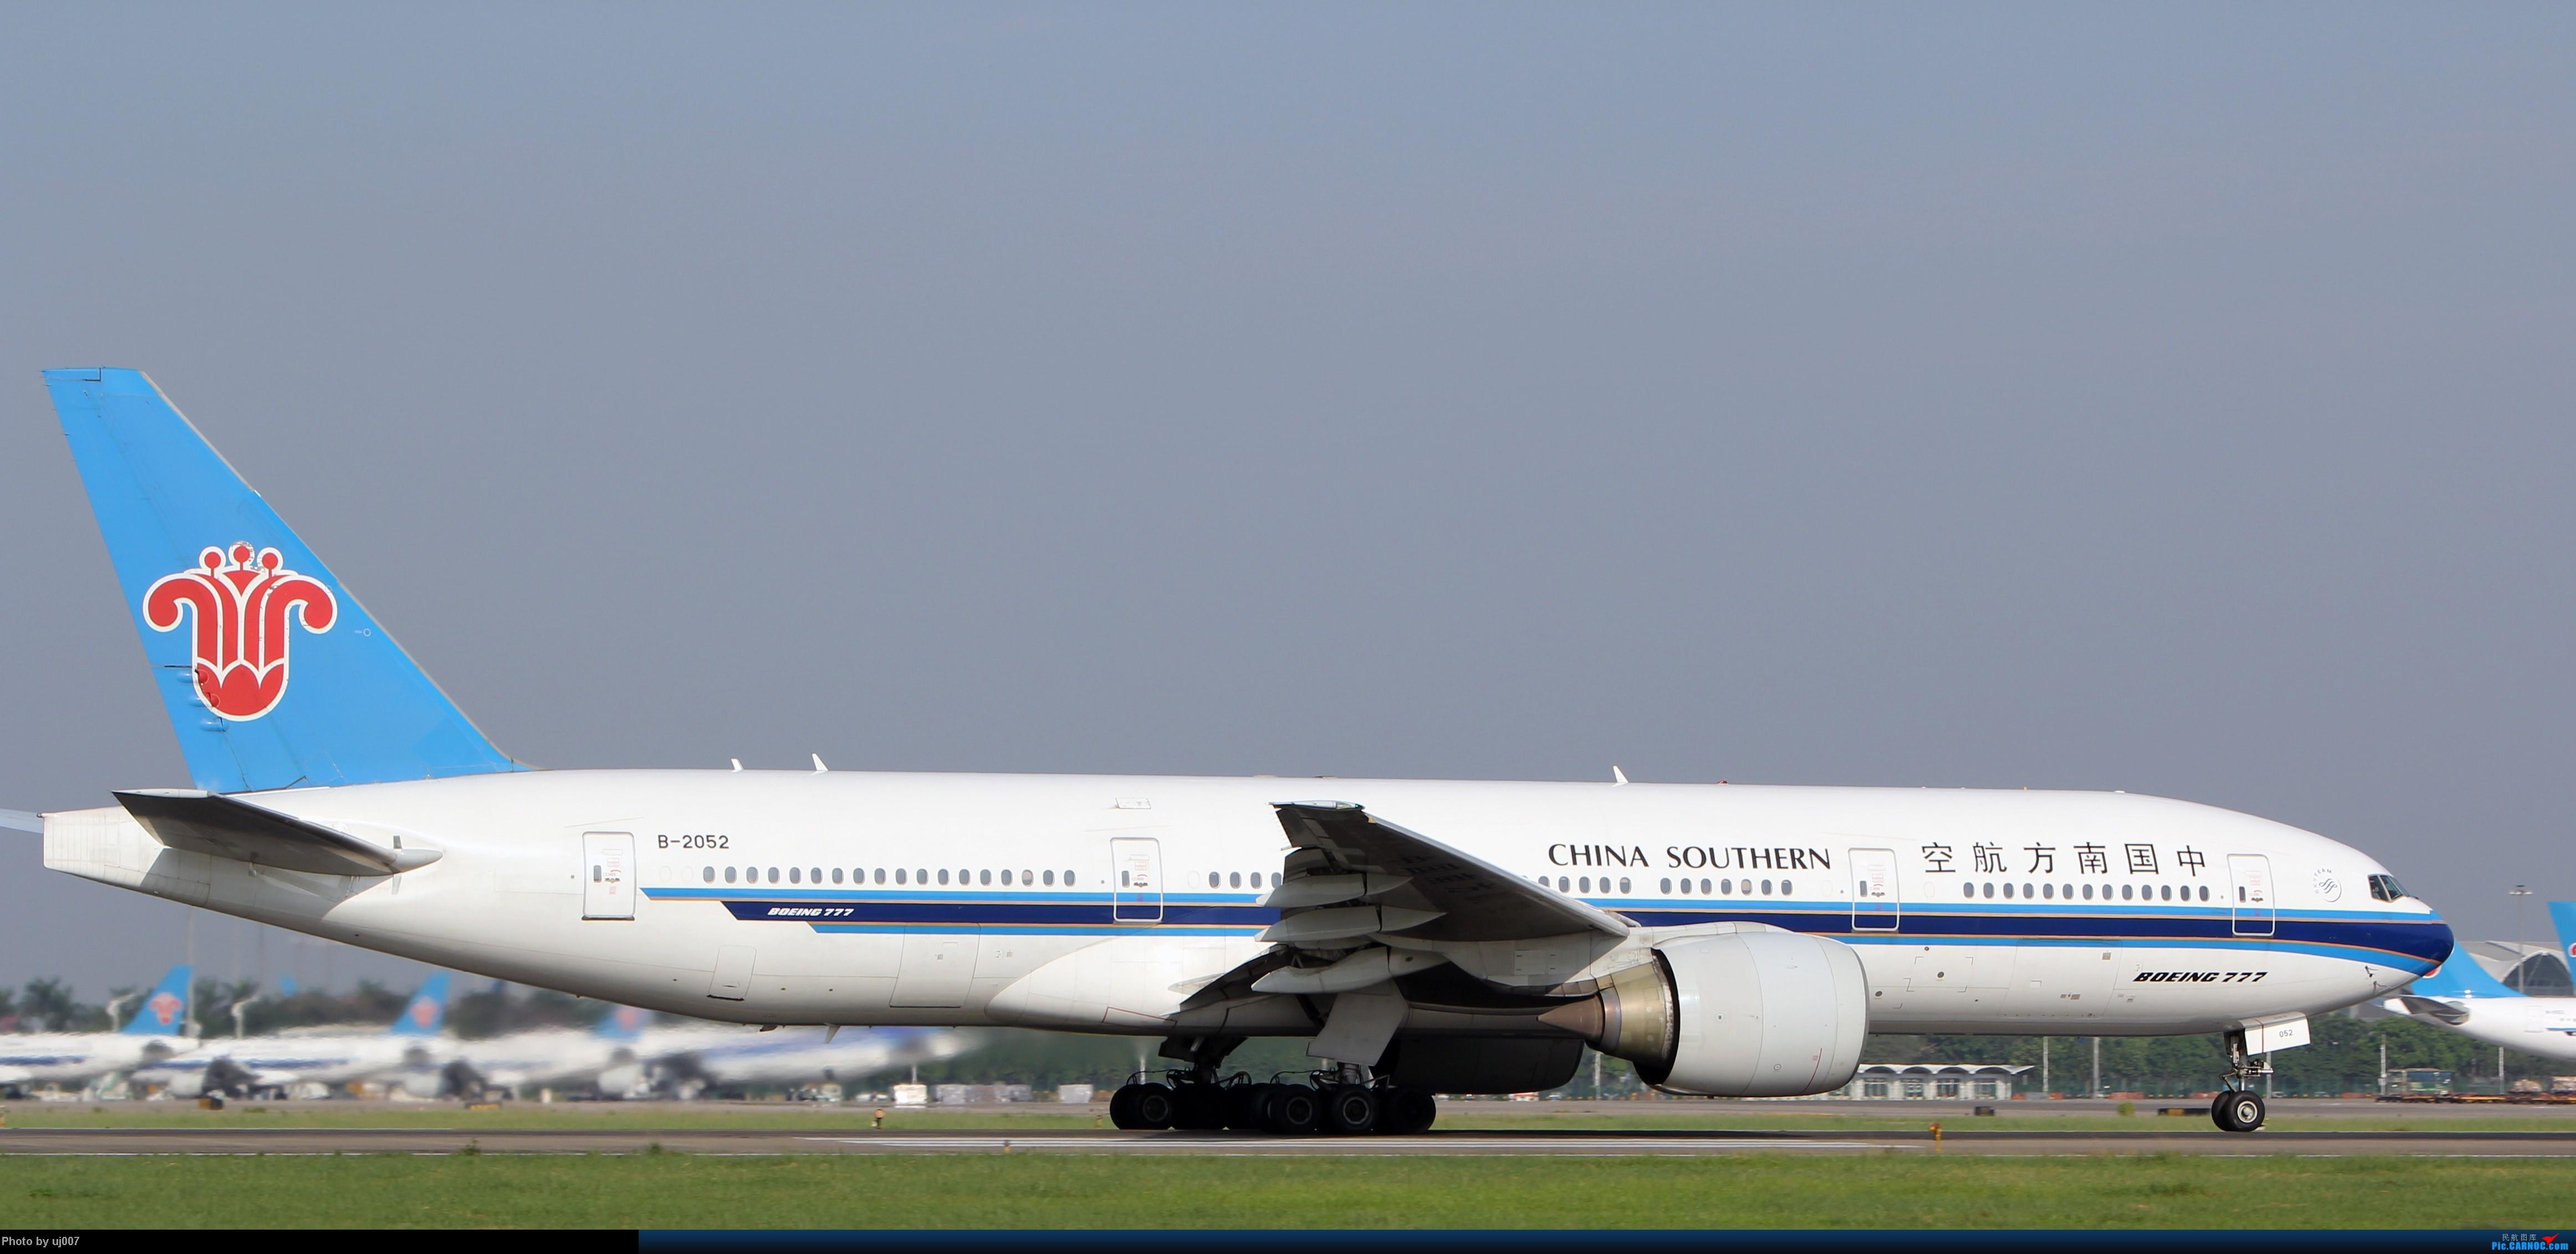 Re:[原创]10月2日白云拍机(大飞机,特别妆,外航,闪灯,擦烟)求指点. BOEING 777-200 B-2052 广州白云国际机场